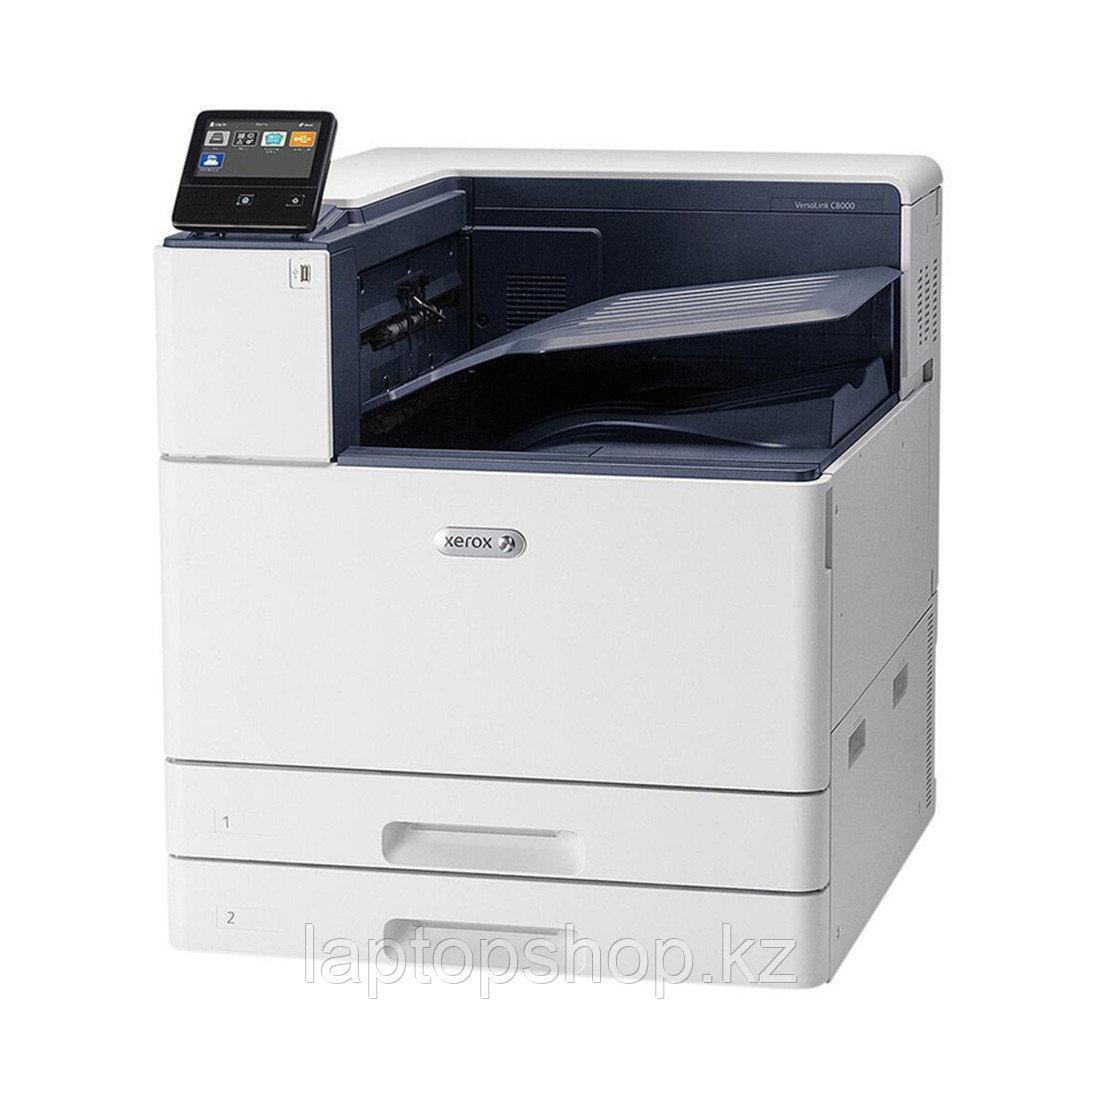 Цветной принтер Xerox VersaLink C8000DT